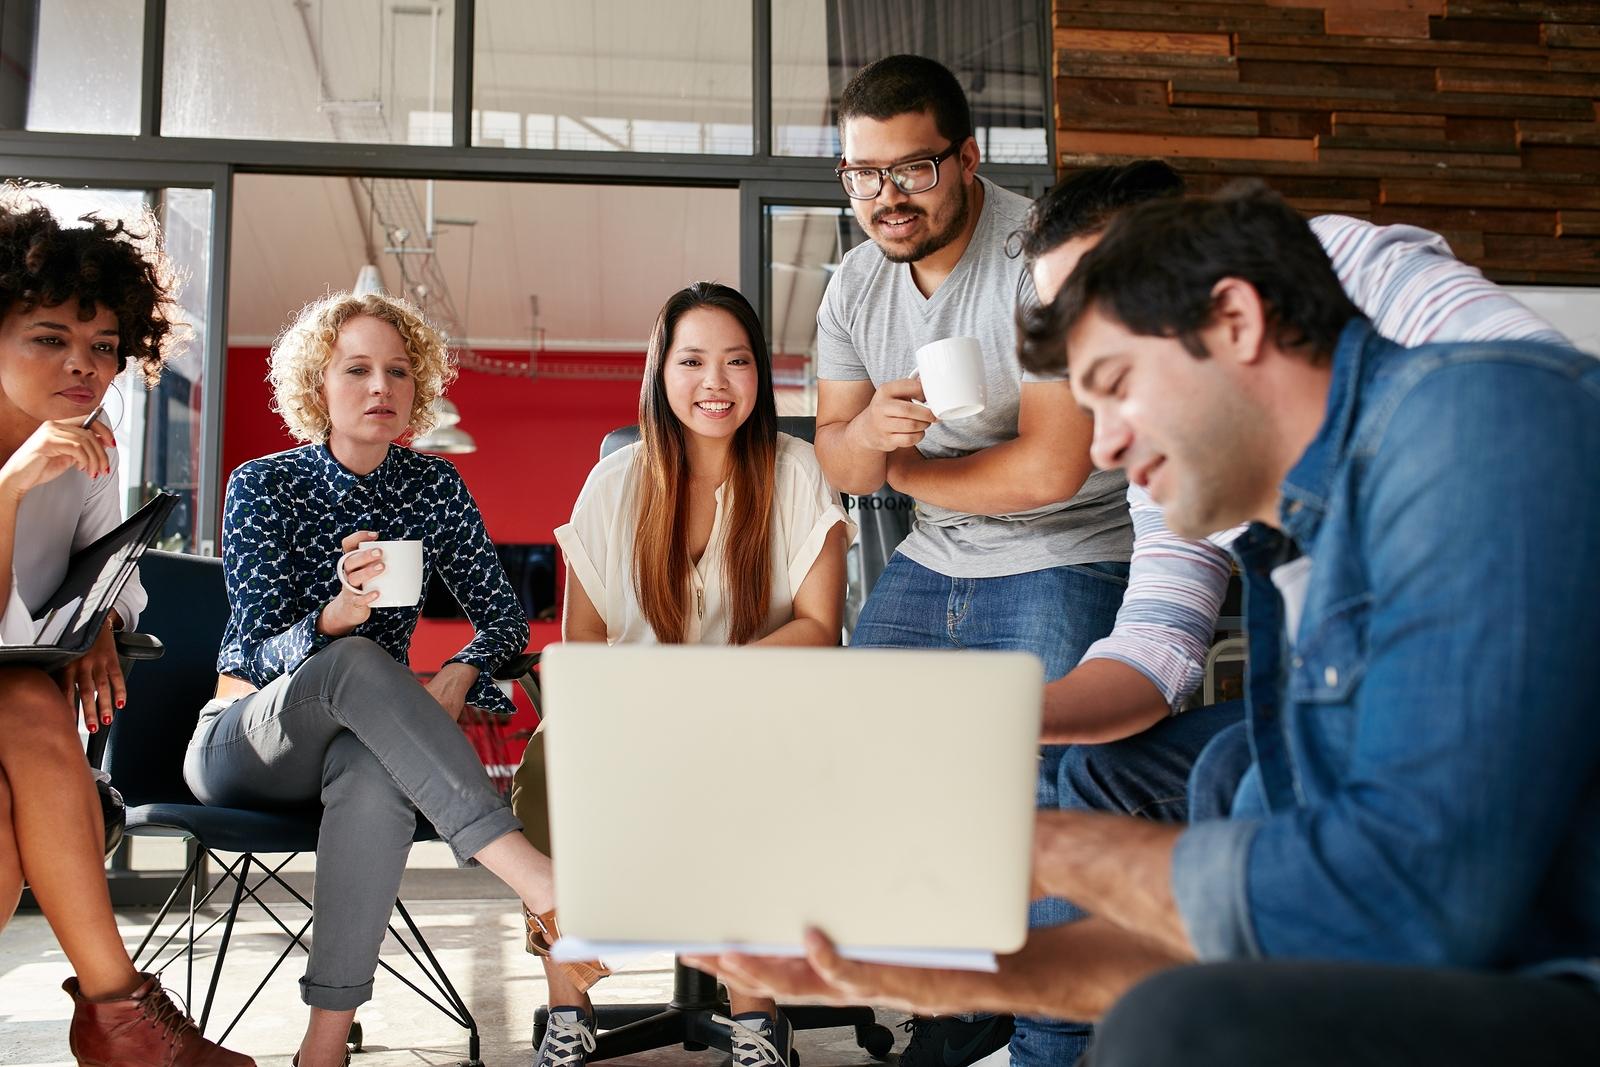 bigstock-Creative-Team-Meeting-At-Offic-115193777-2.jpg